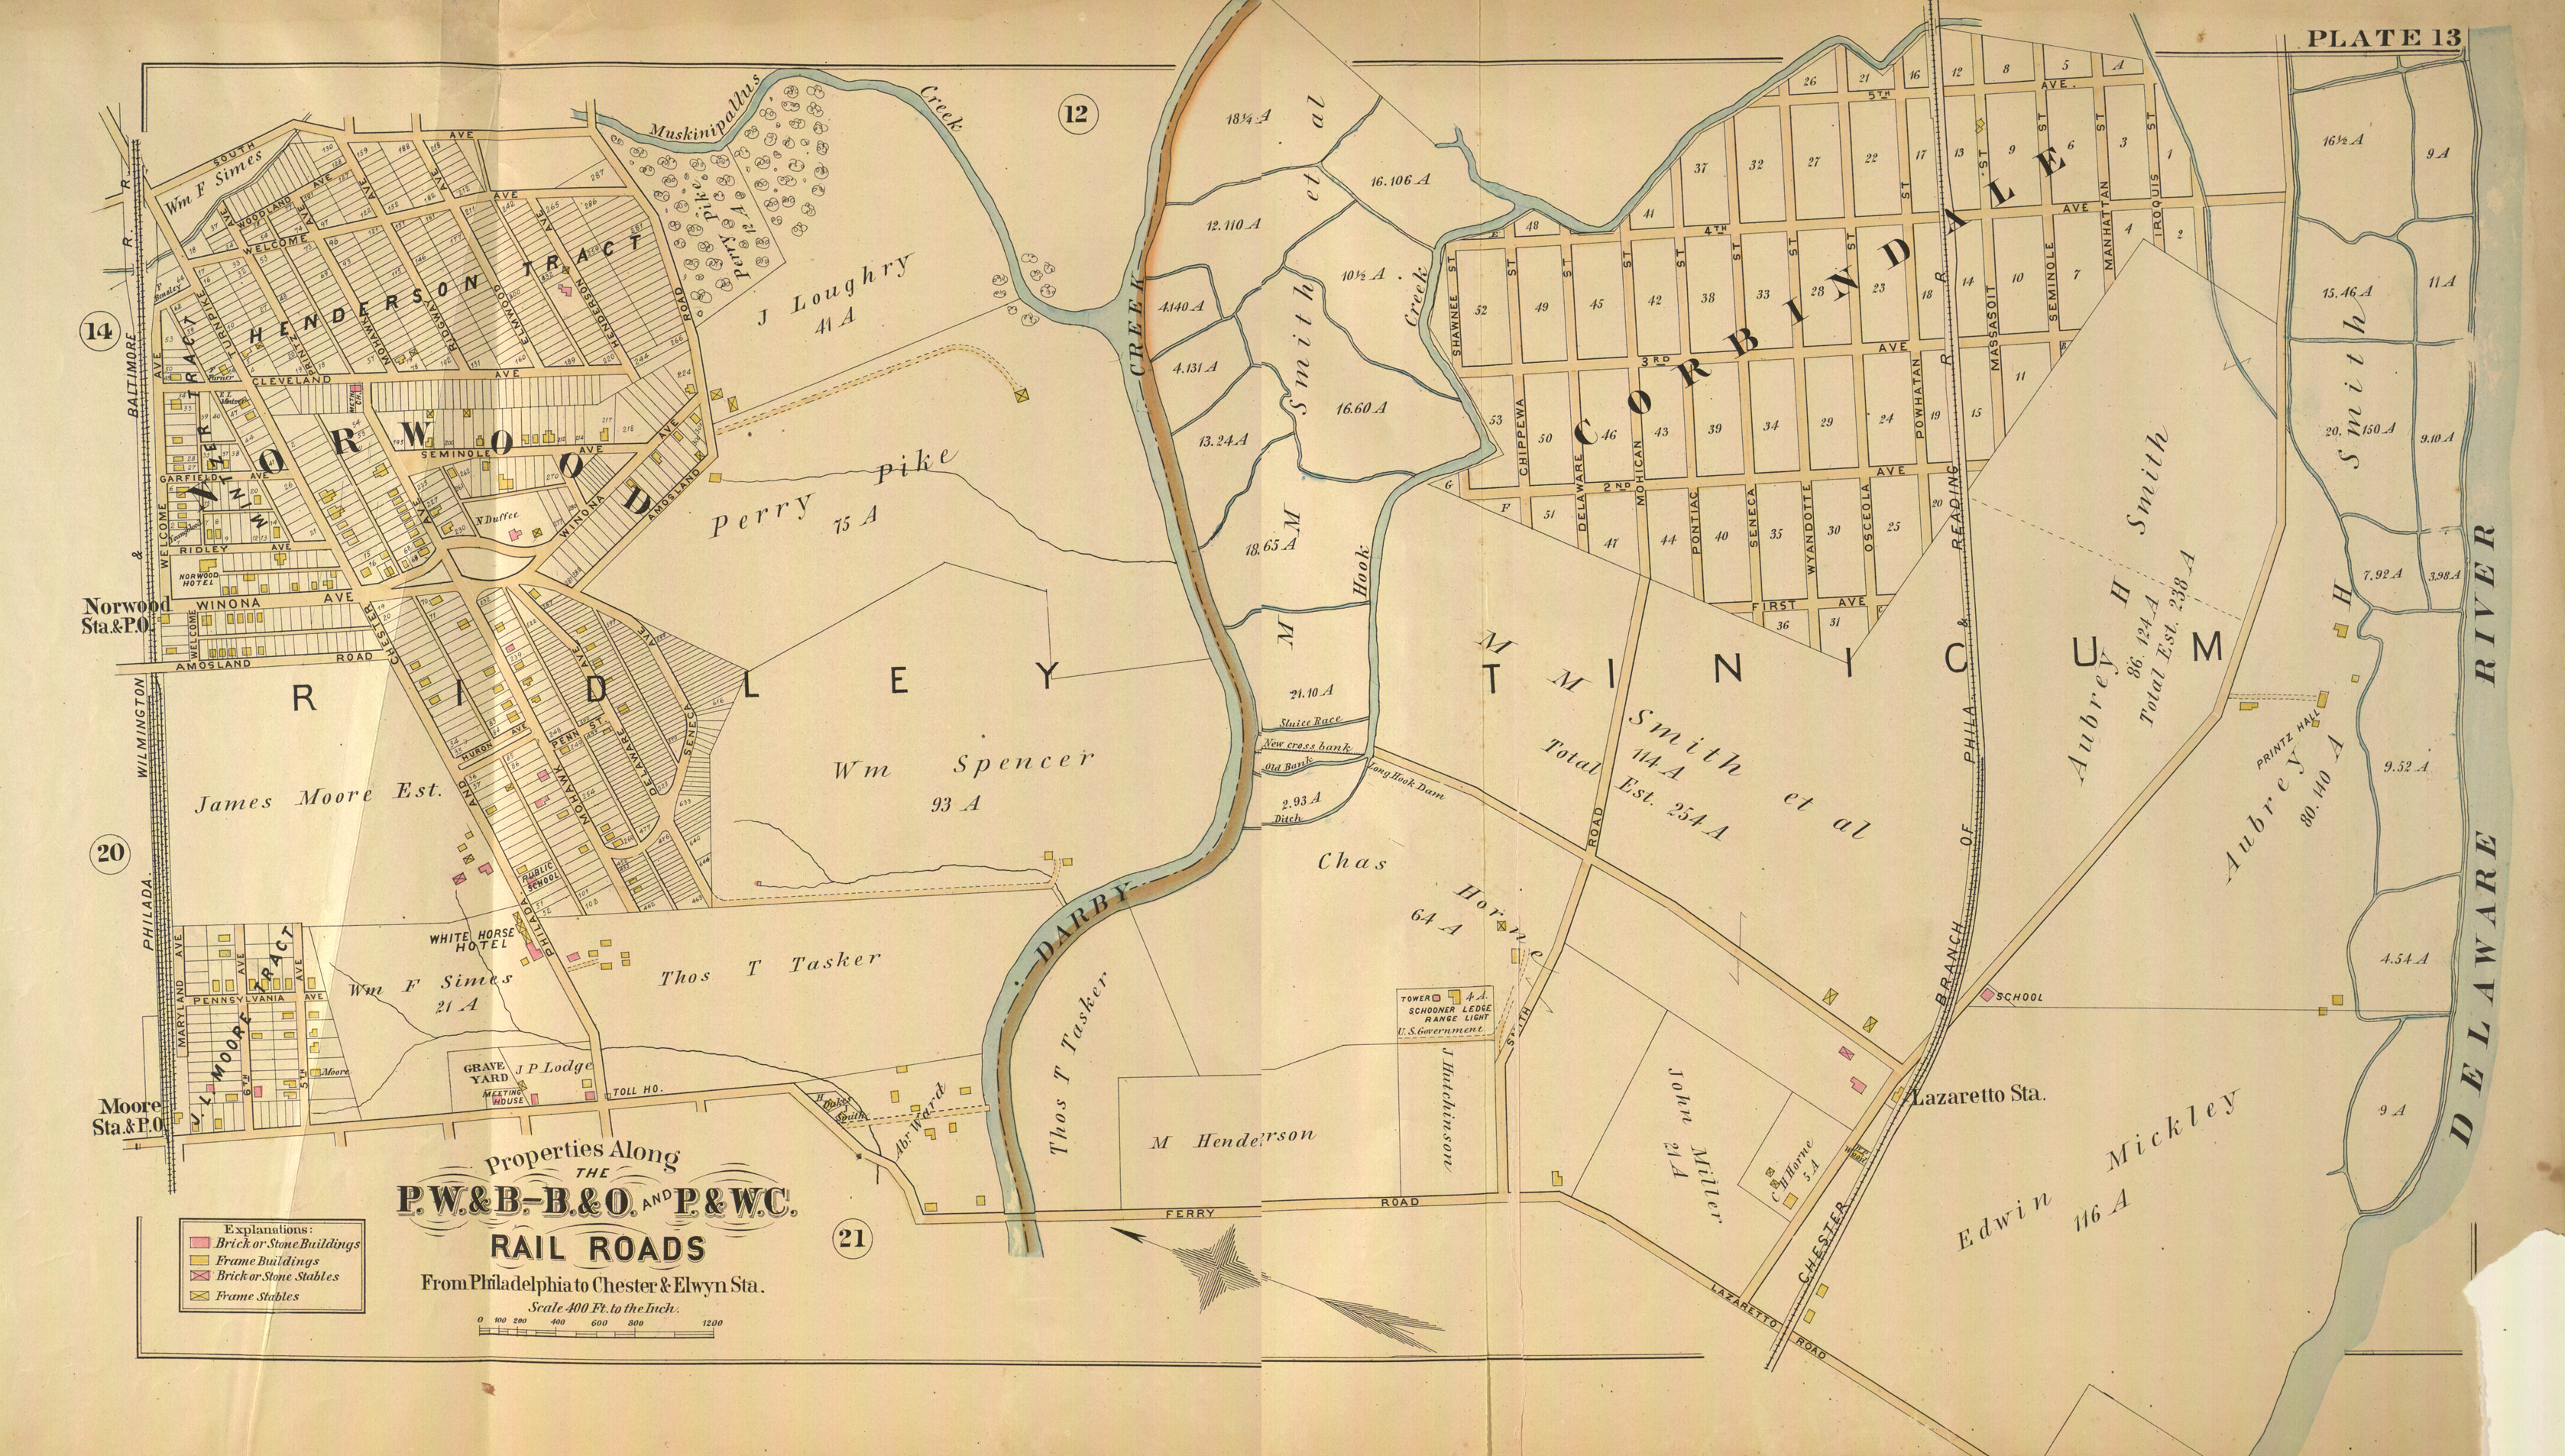 Tini Twp 1810 U S Census Tini Twp 1820 U S Census